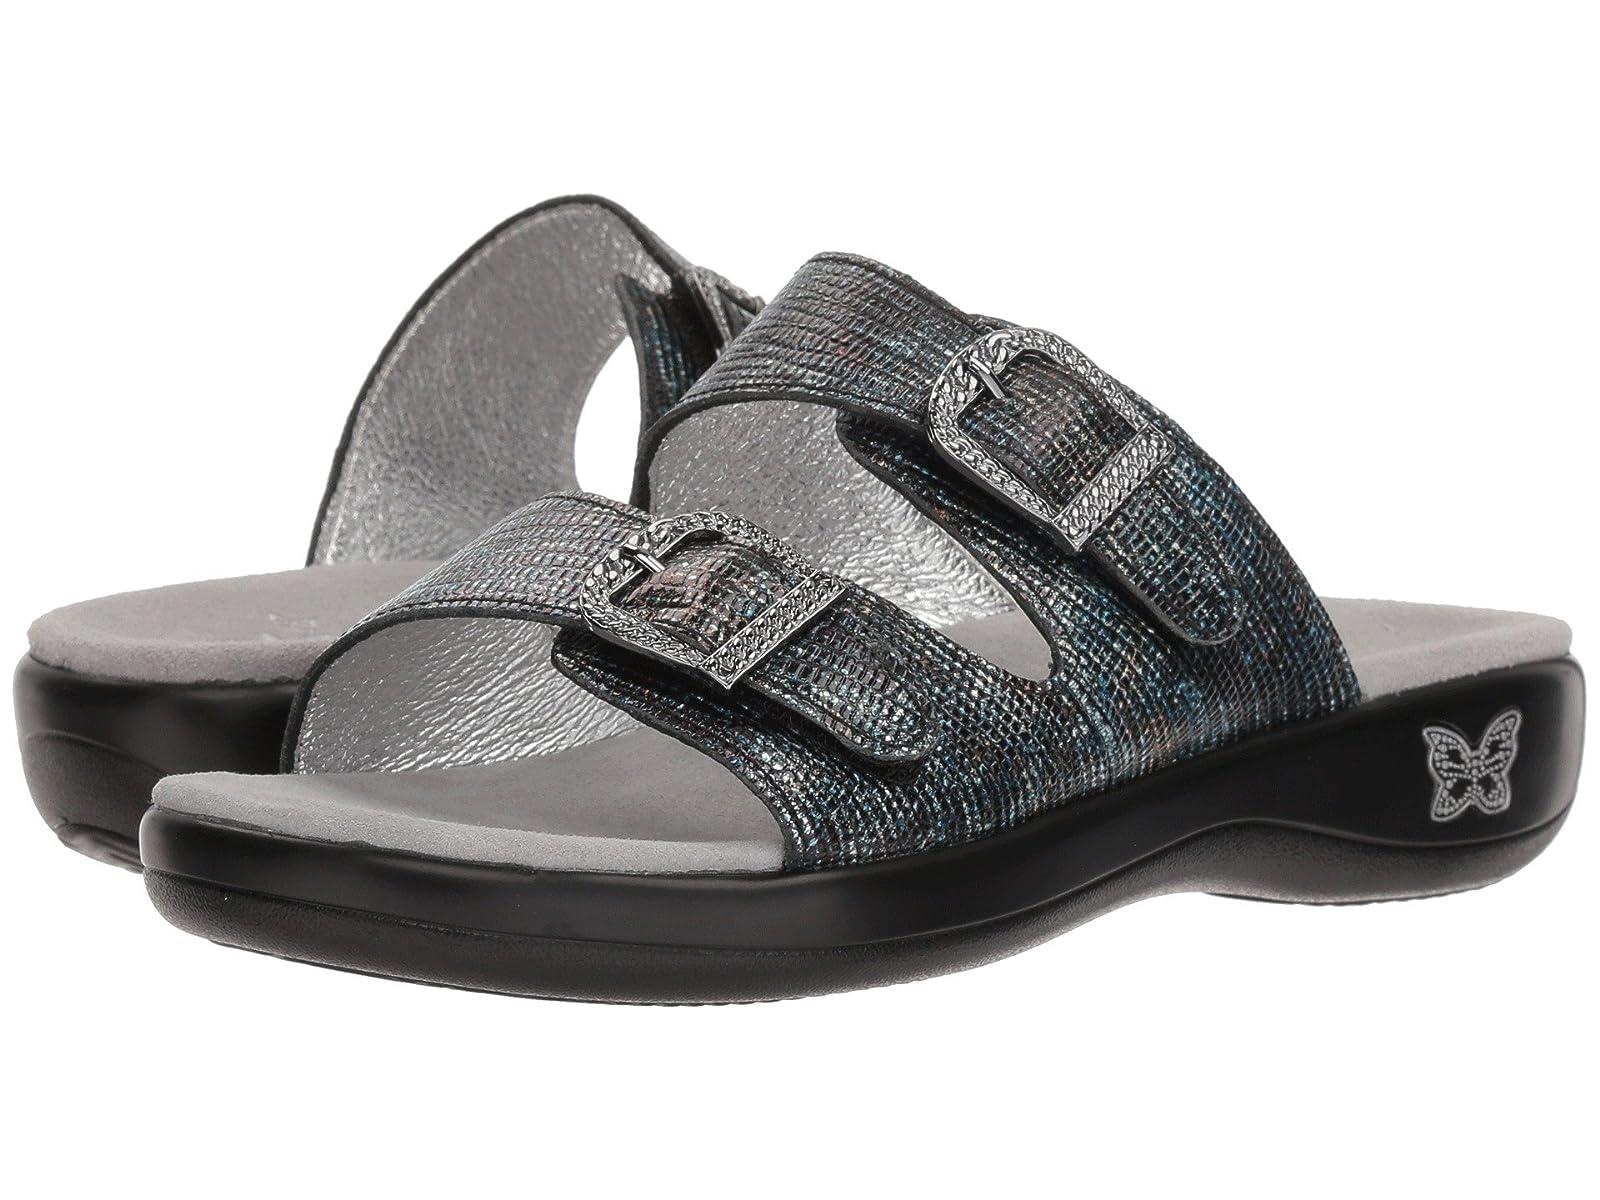 Alegria JadeAtmospheric grades have affordable shoes